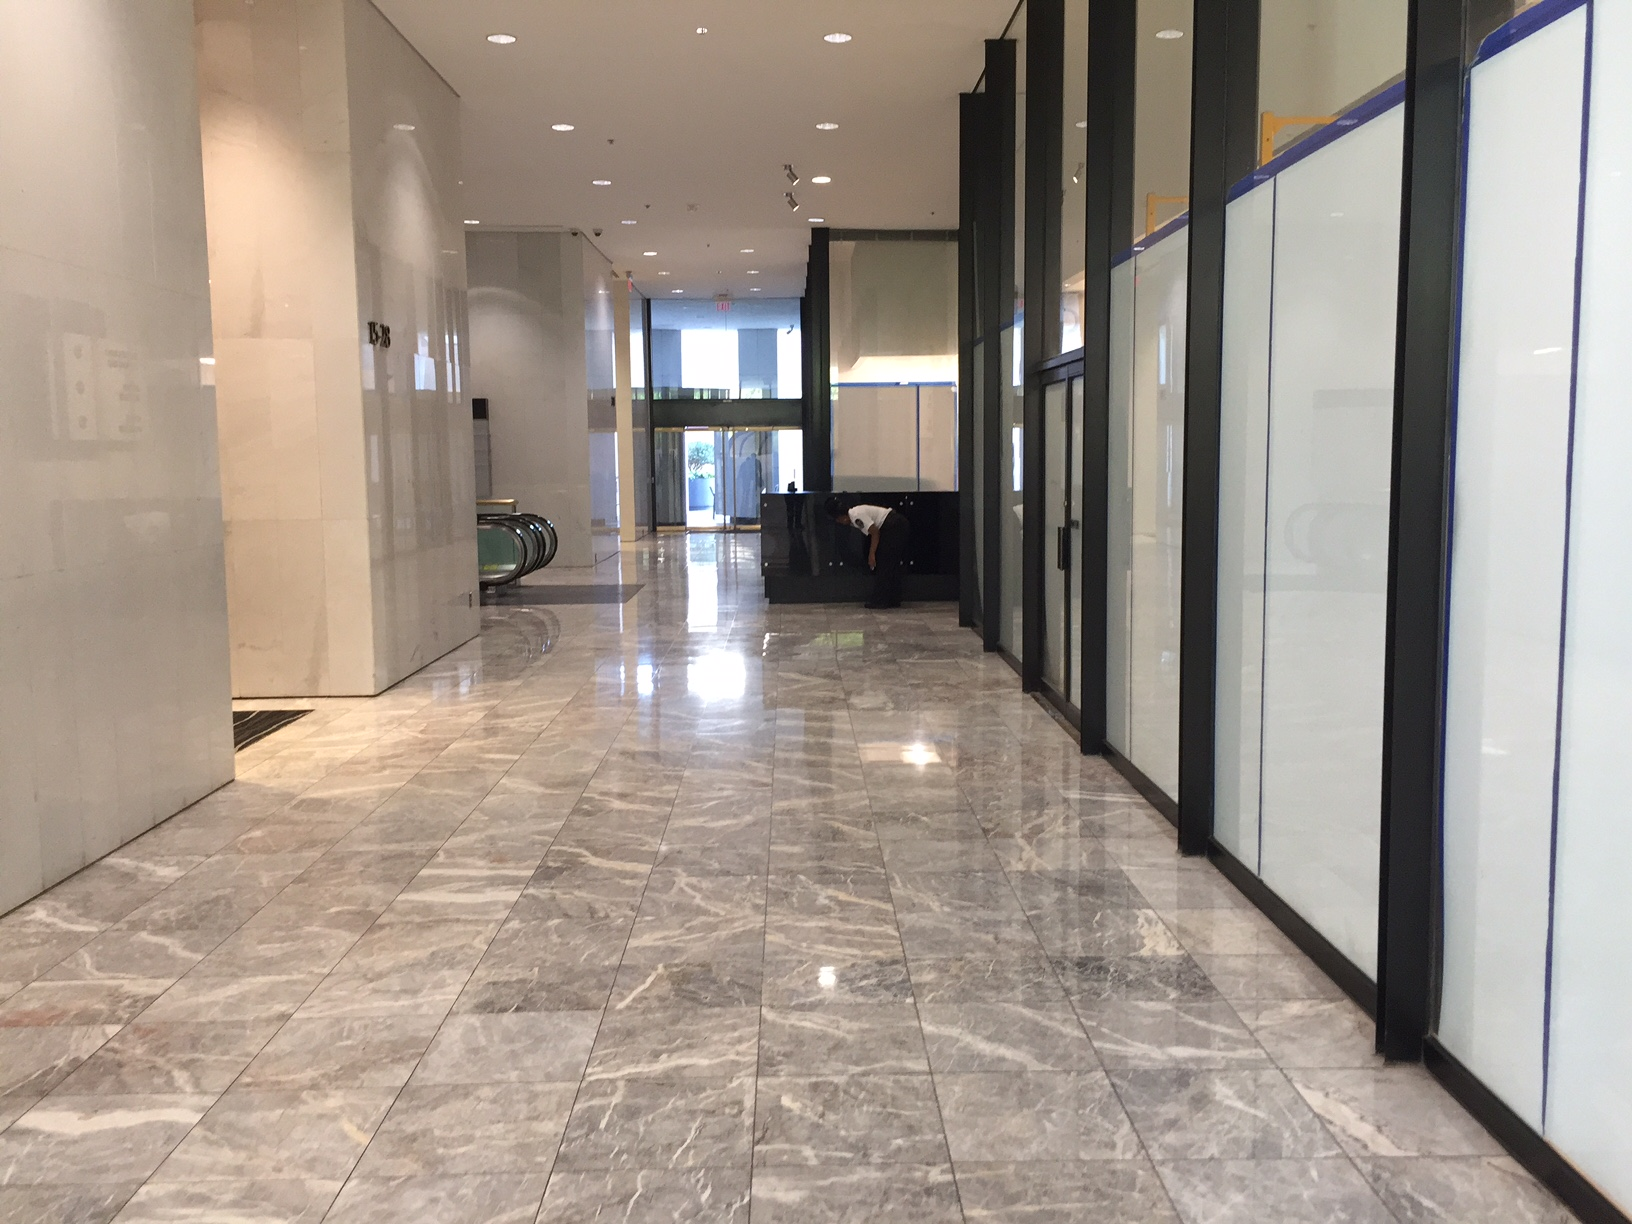 Enter an office building.  Walk towards the desk.